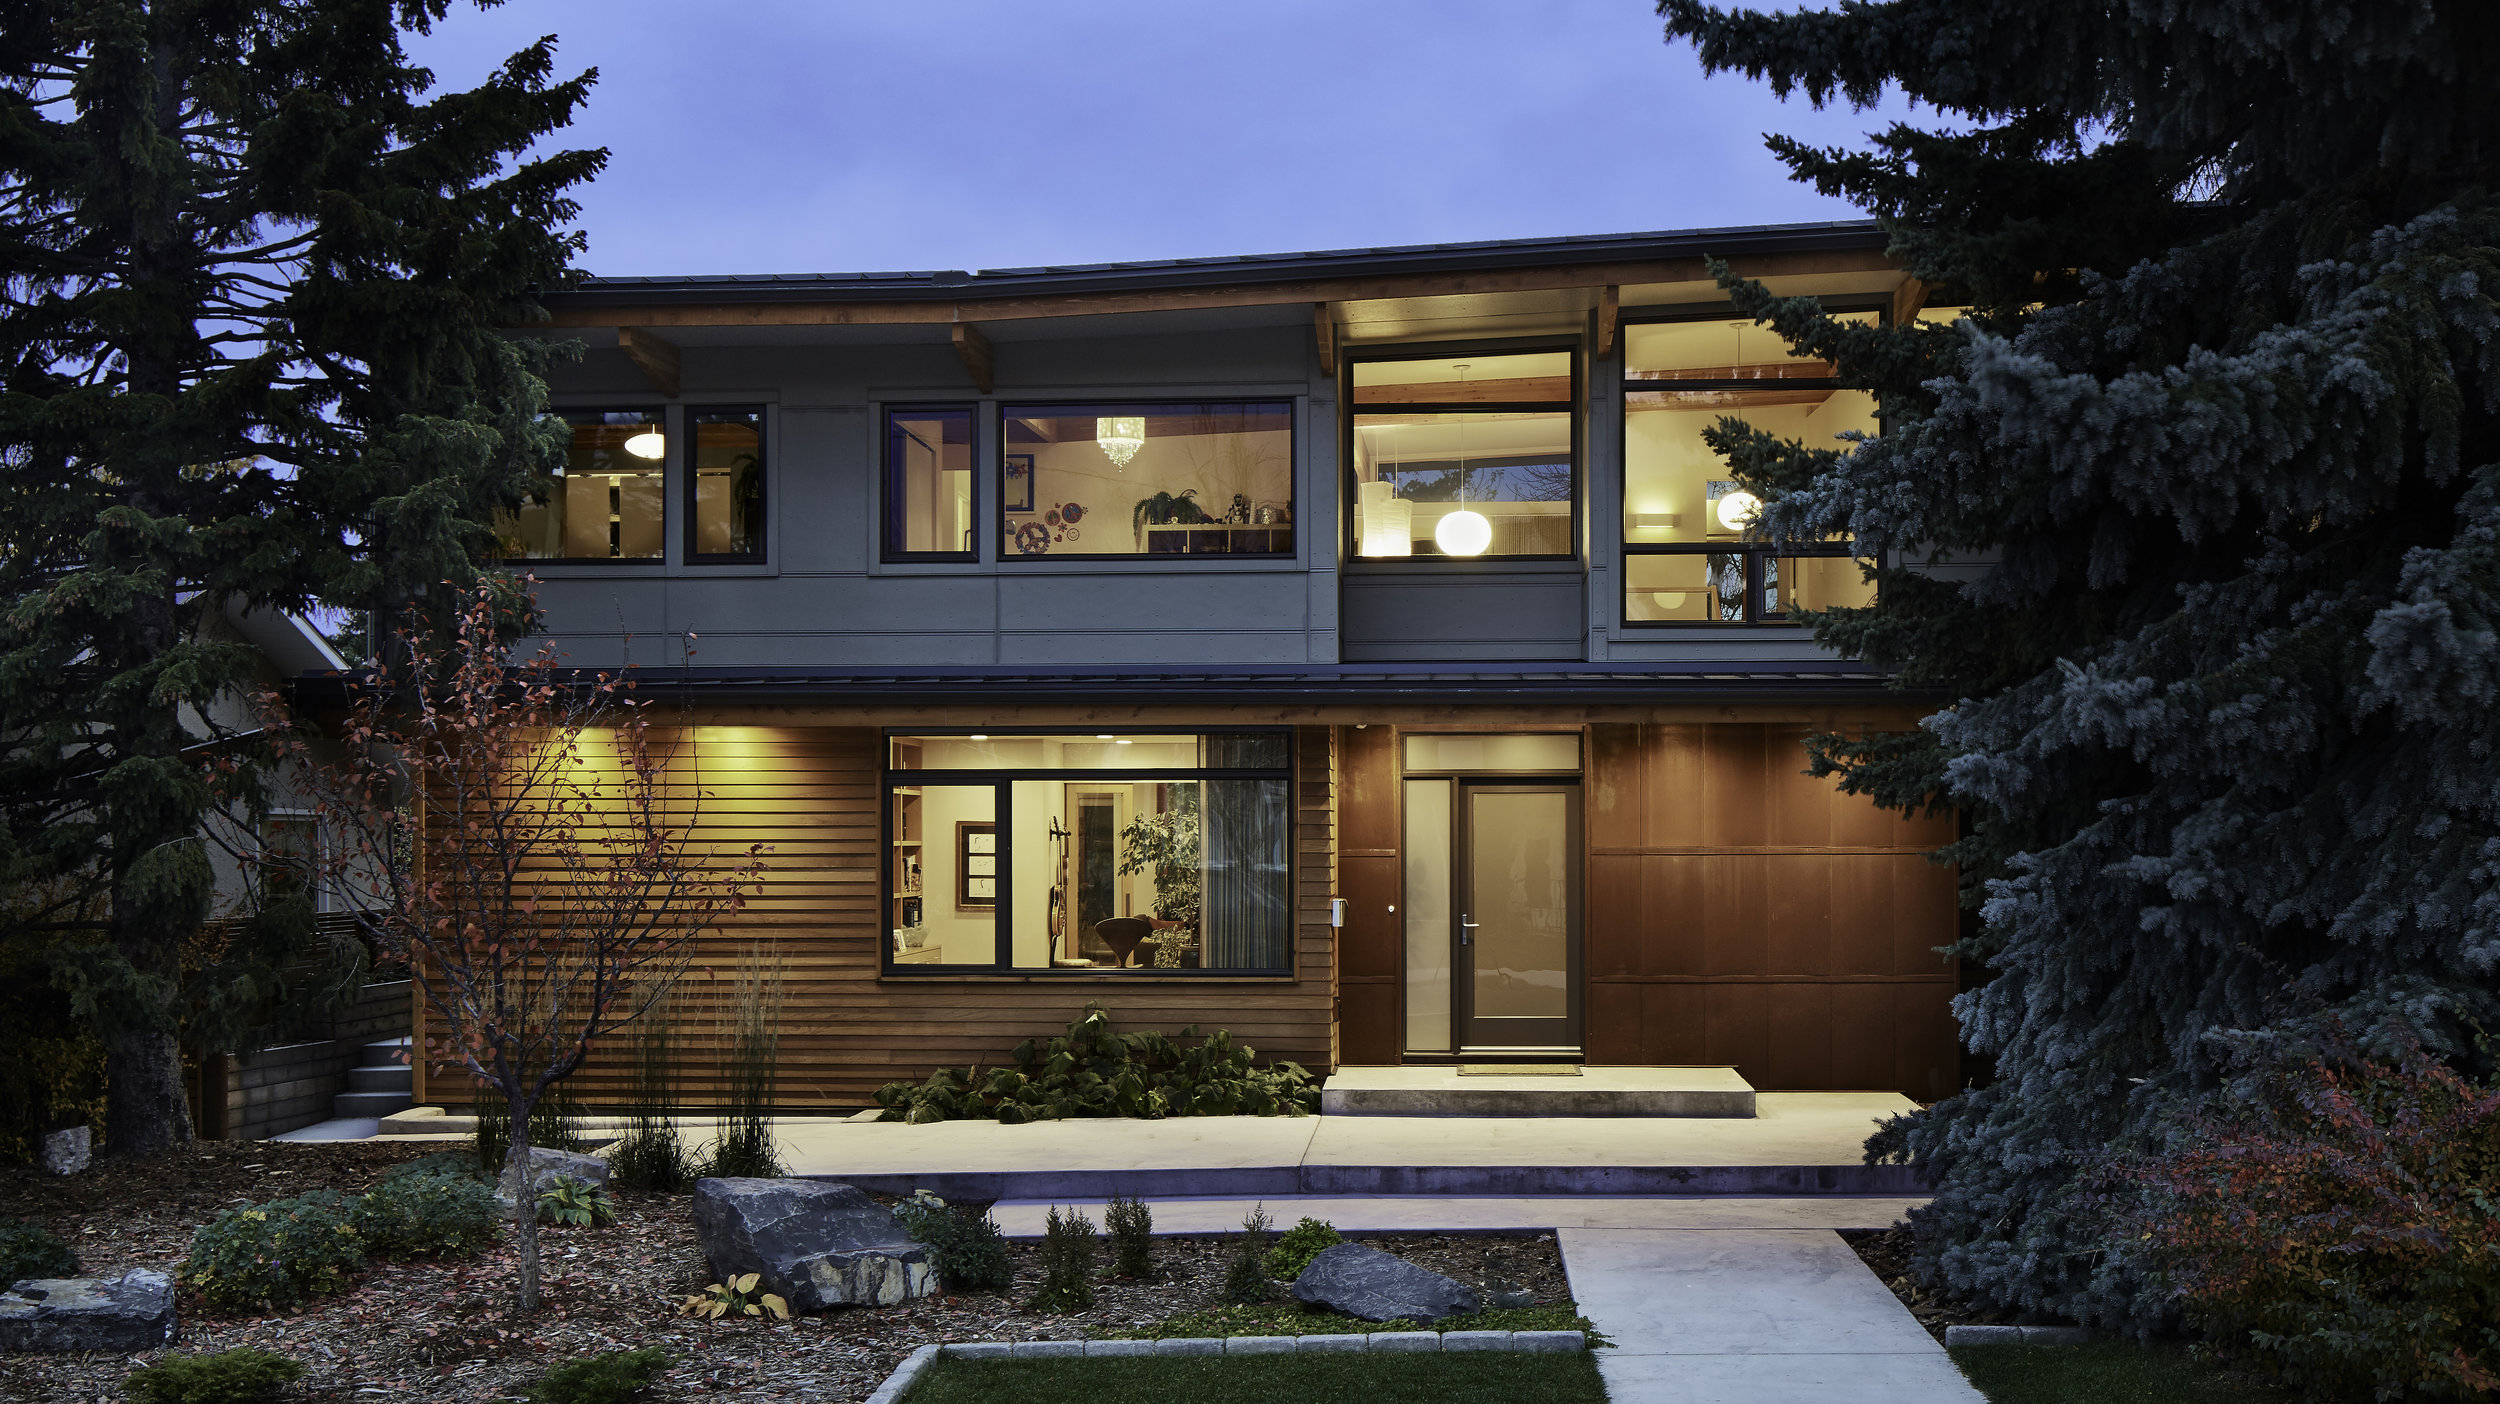 turkel_modern_design_prefab_home_mckay_calgary_testimonial.jpg